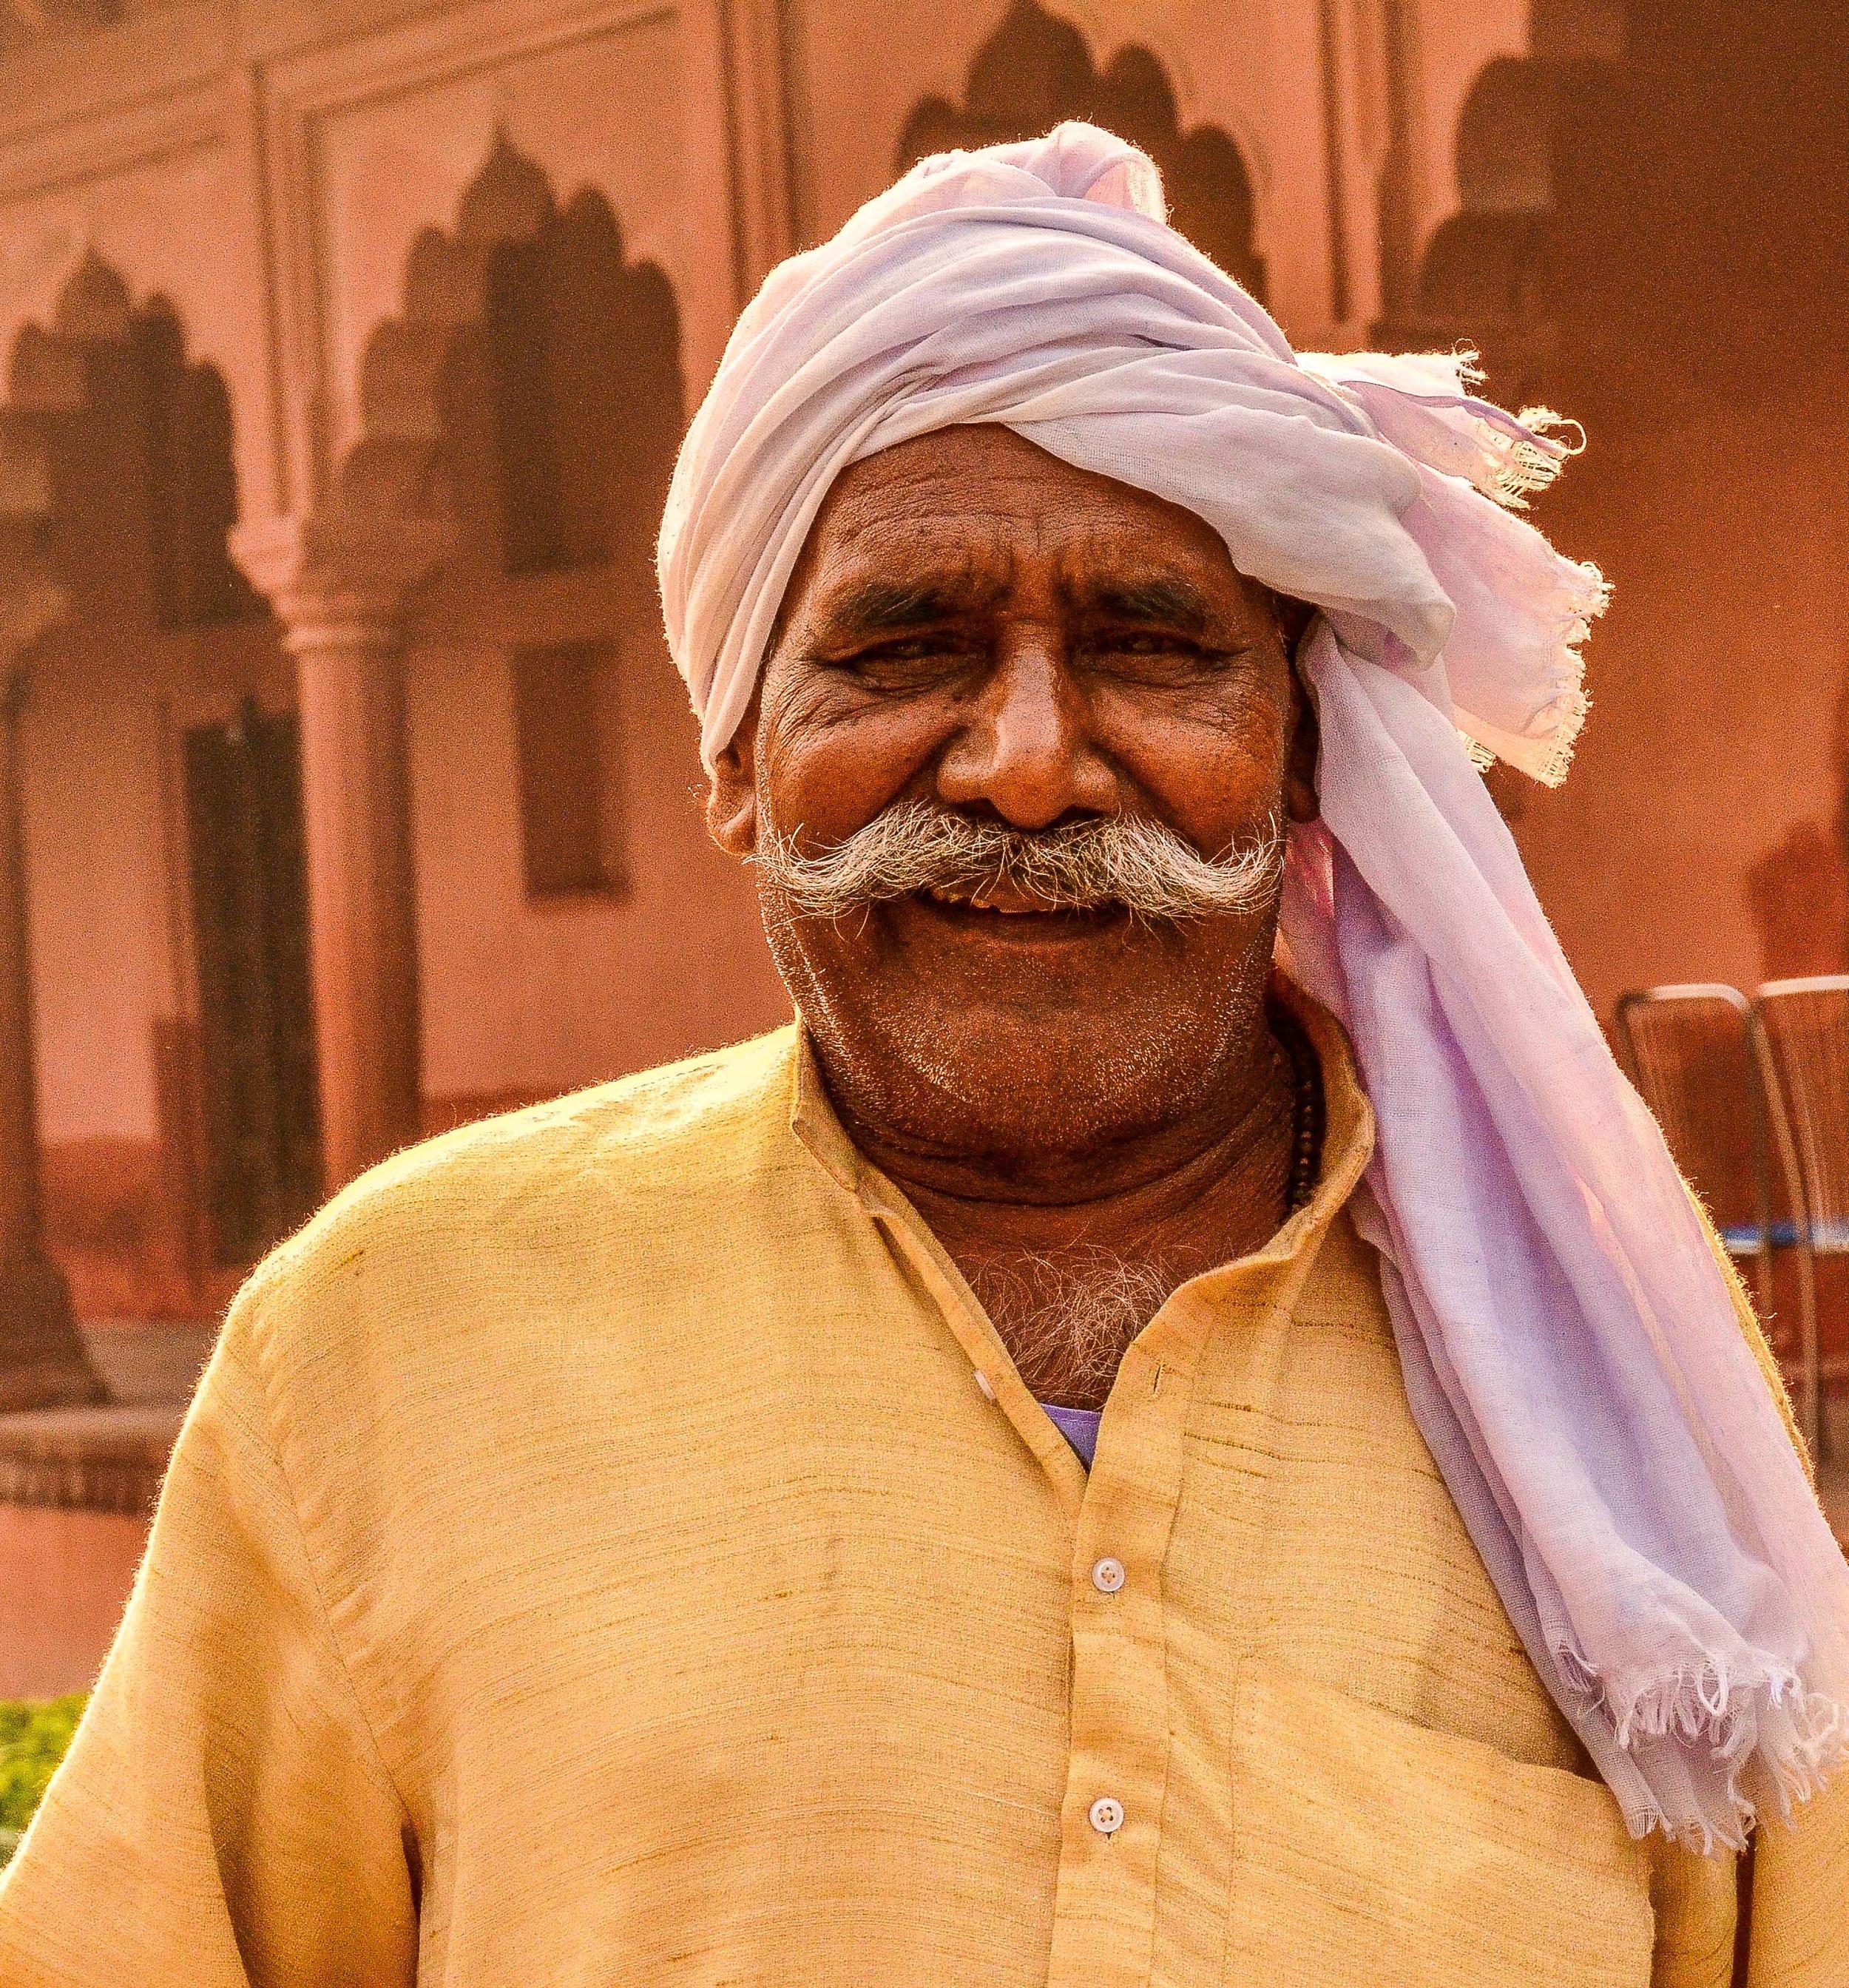 Agra, India 2012